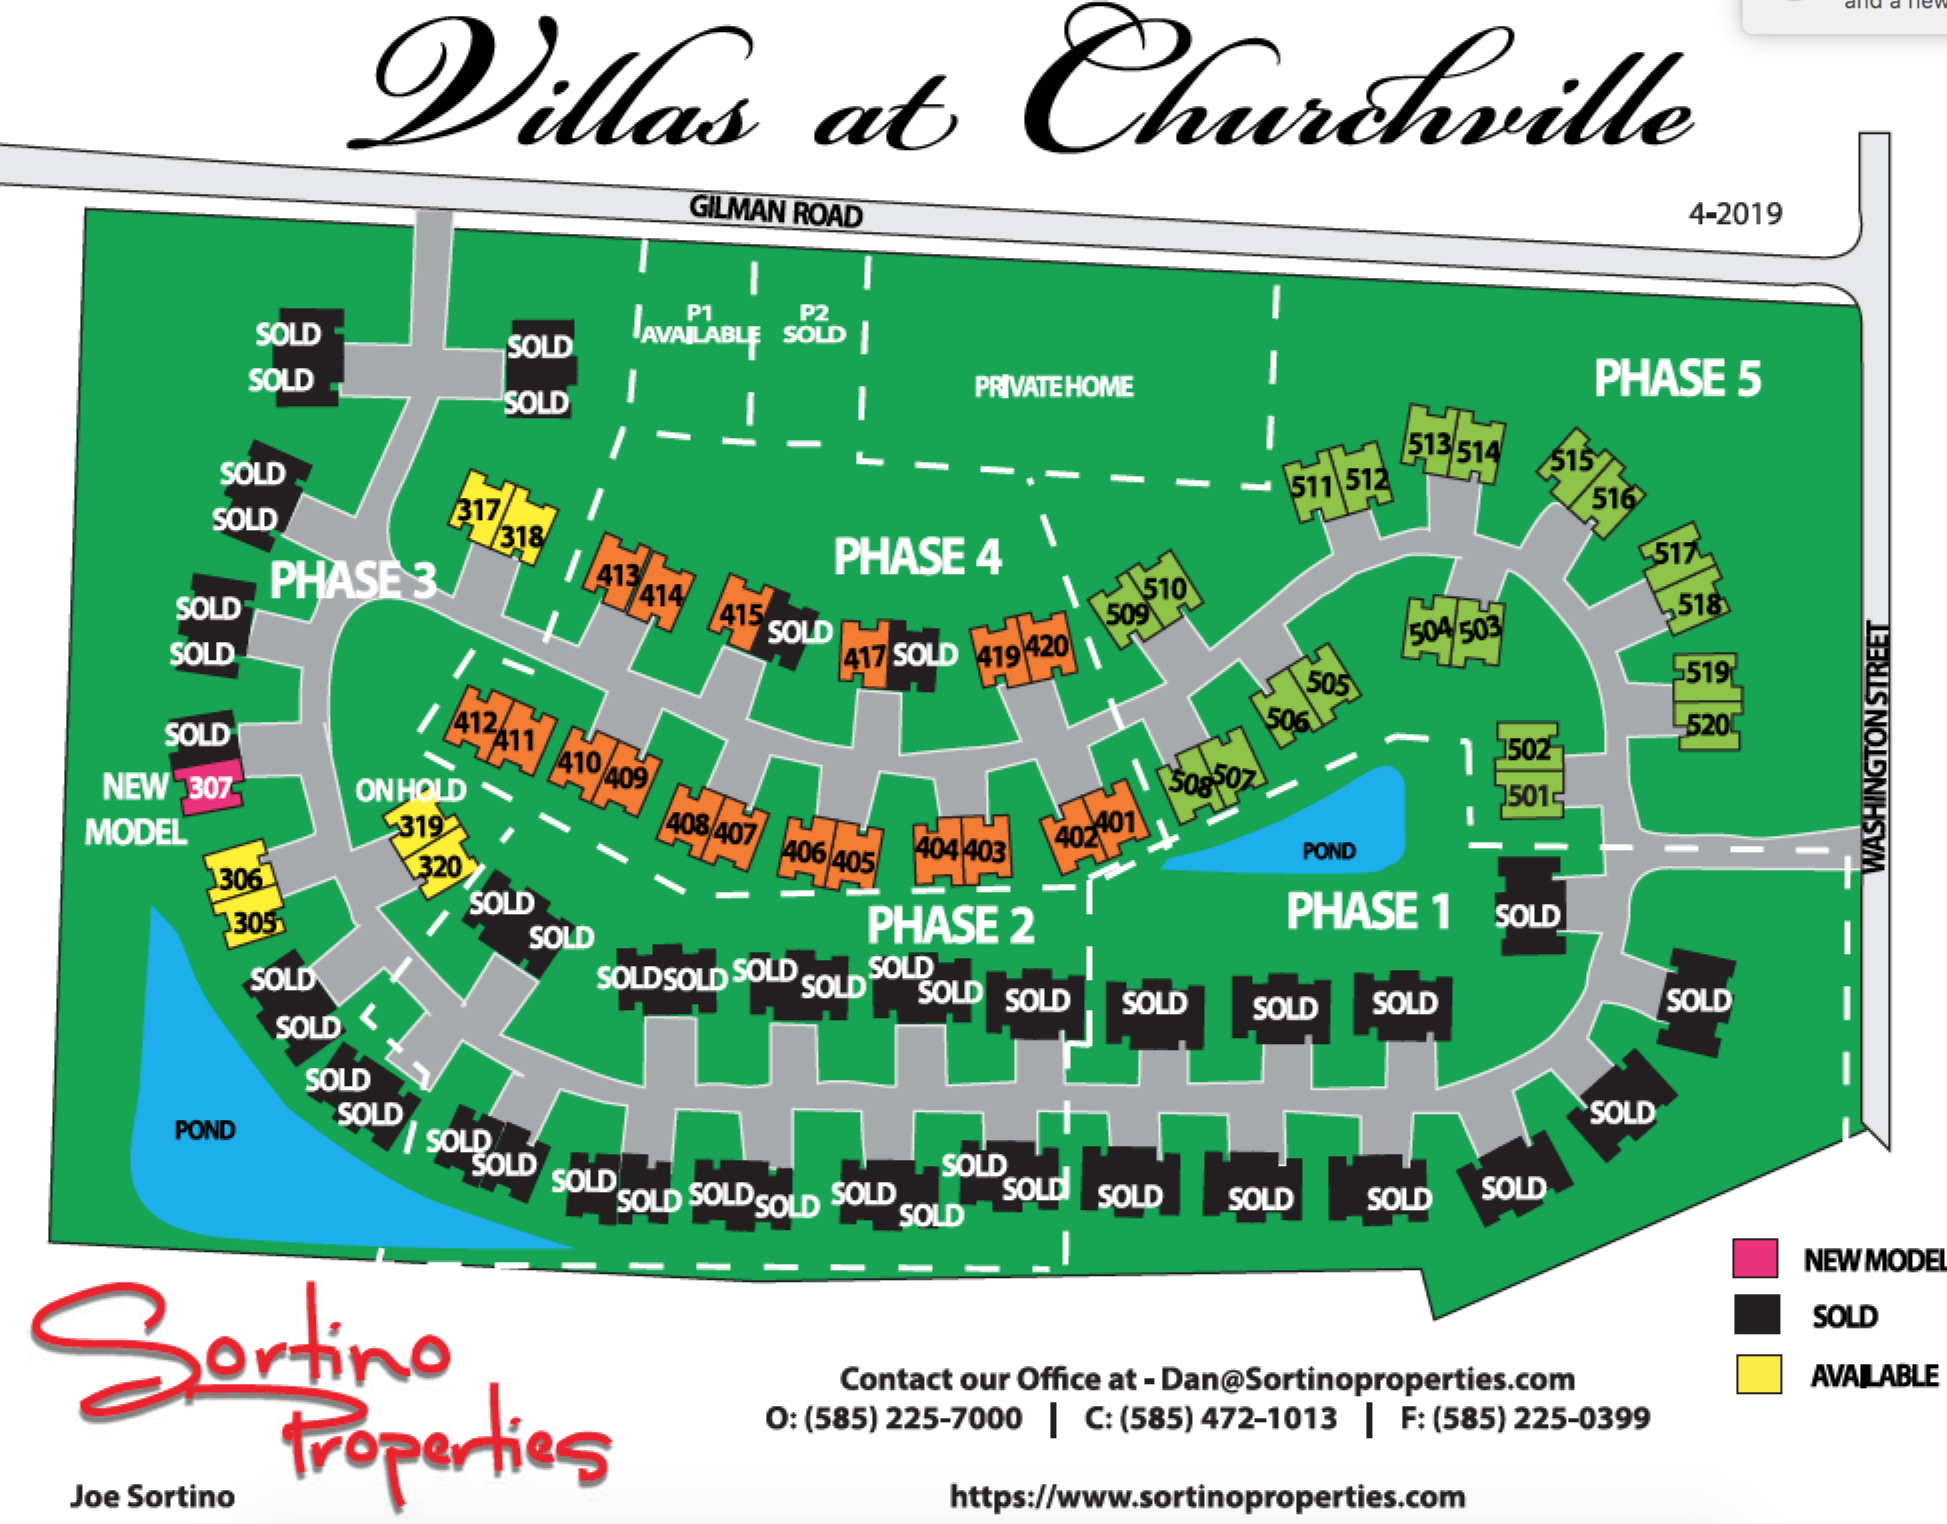 VILLAS AT CHURCHVILLE SITE MAP